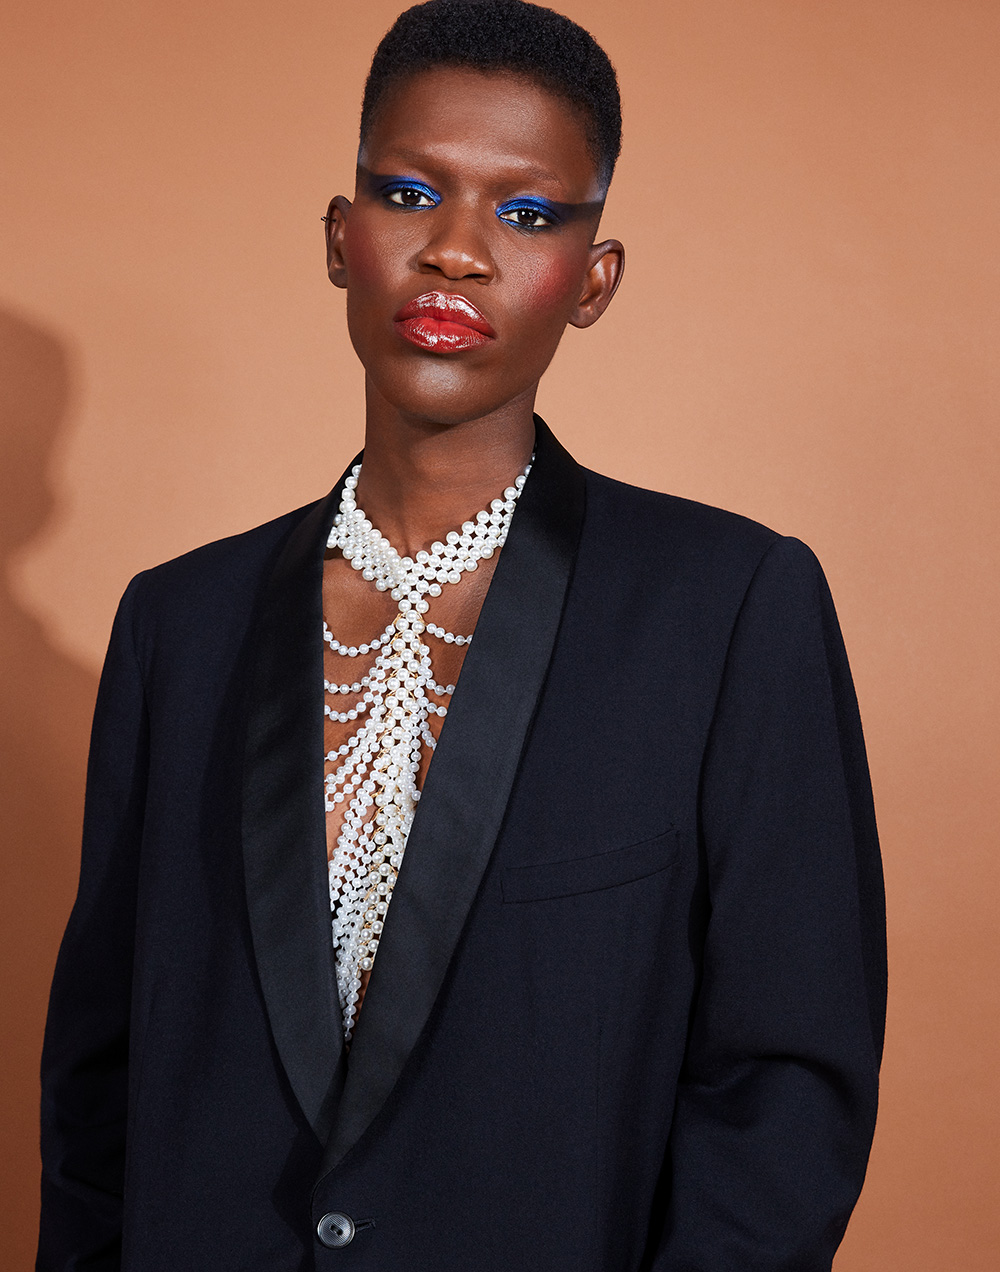 blazer JUNYA WATANABE, necklace Stylist's Own